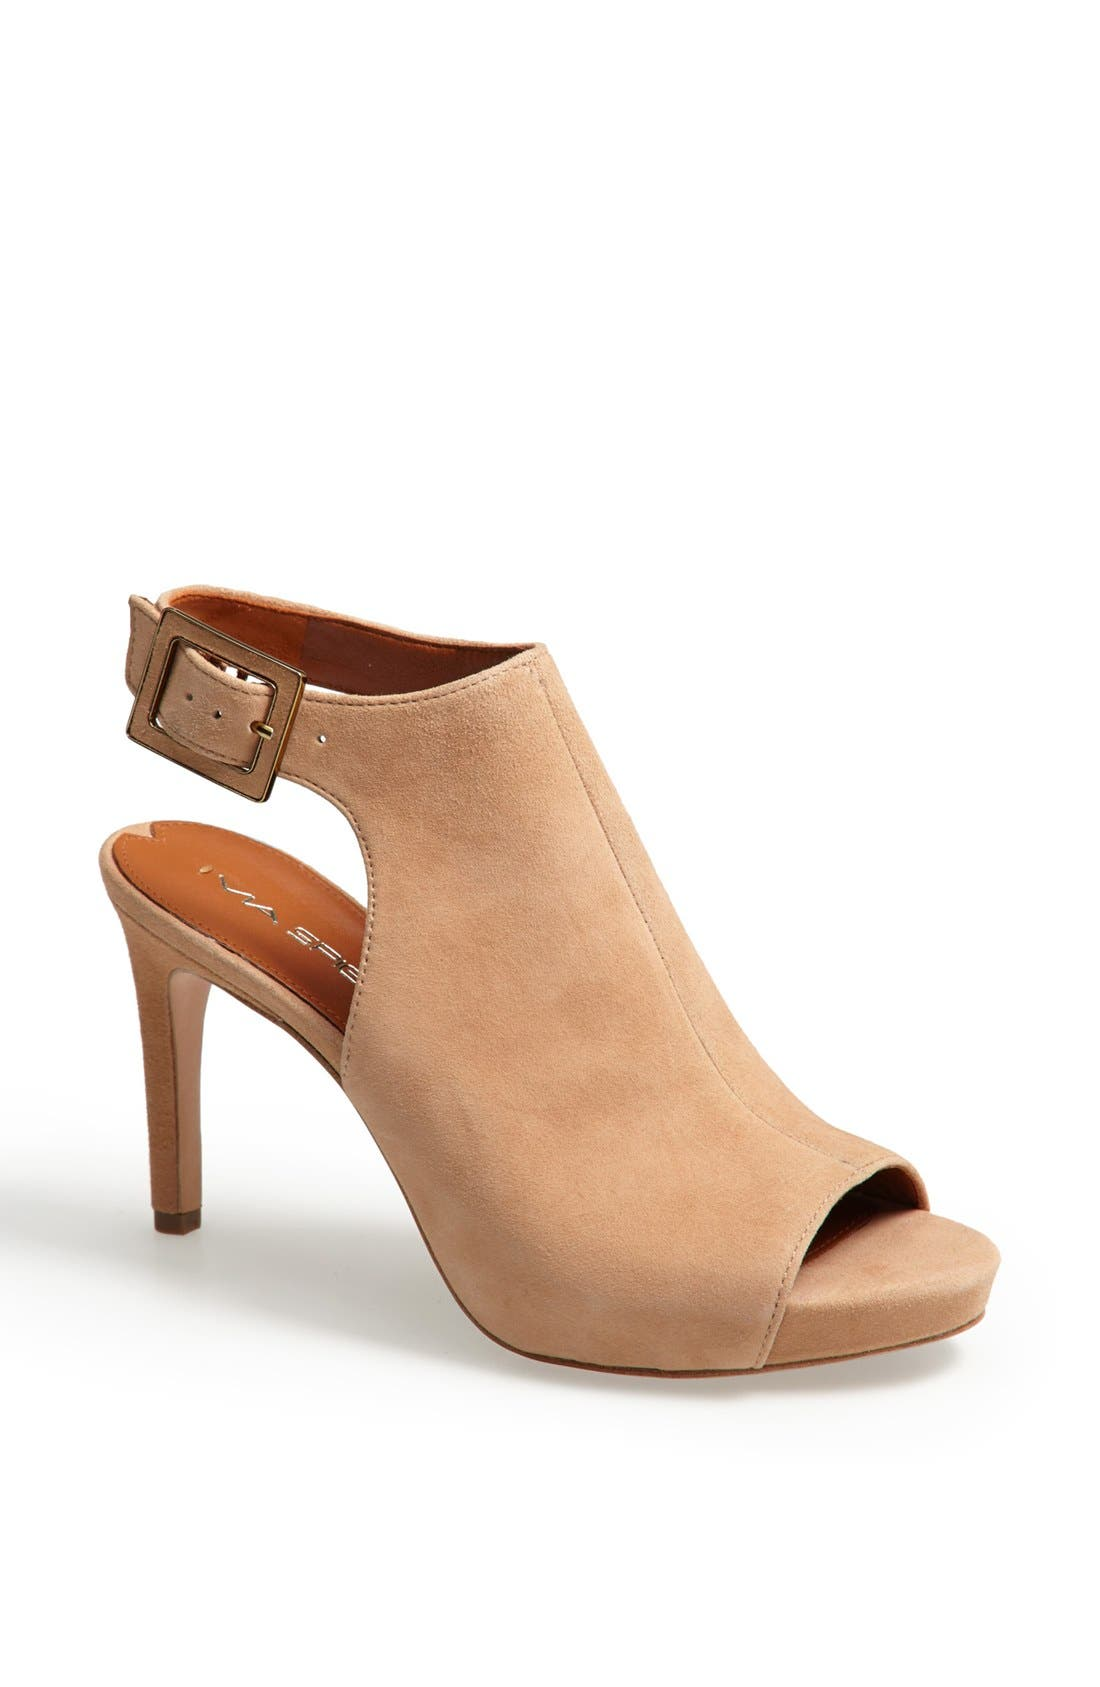 'Nino' Ankle Strap Sandal,                         Main,                         color, Desert Suede